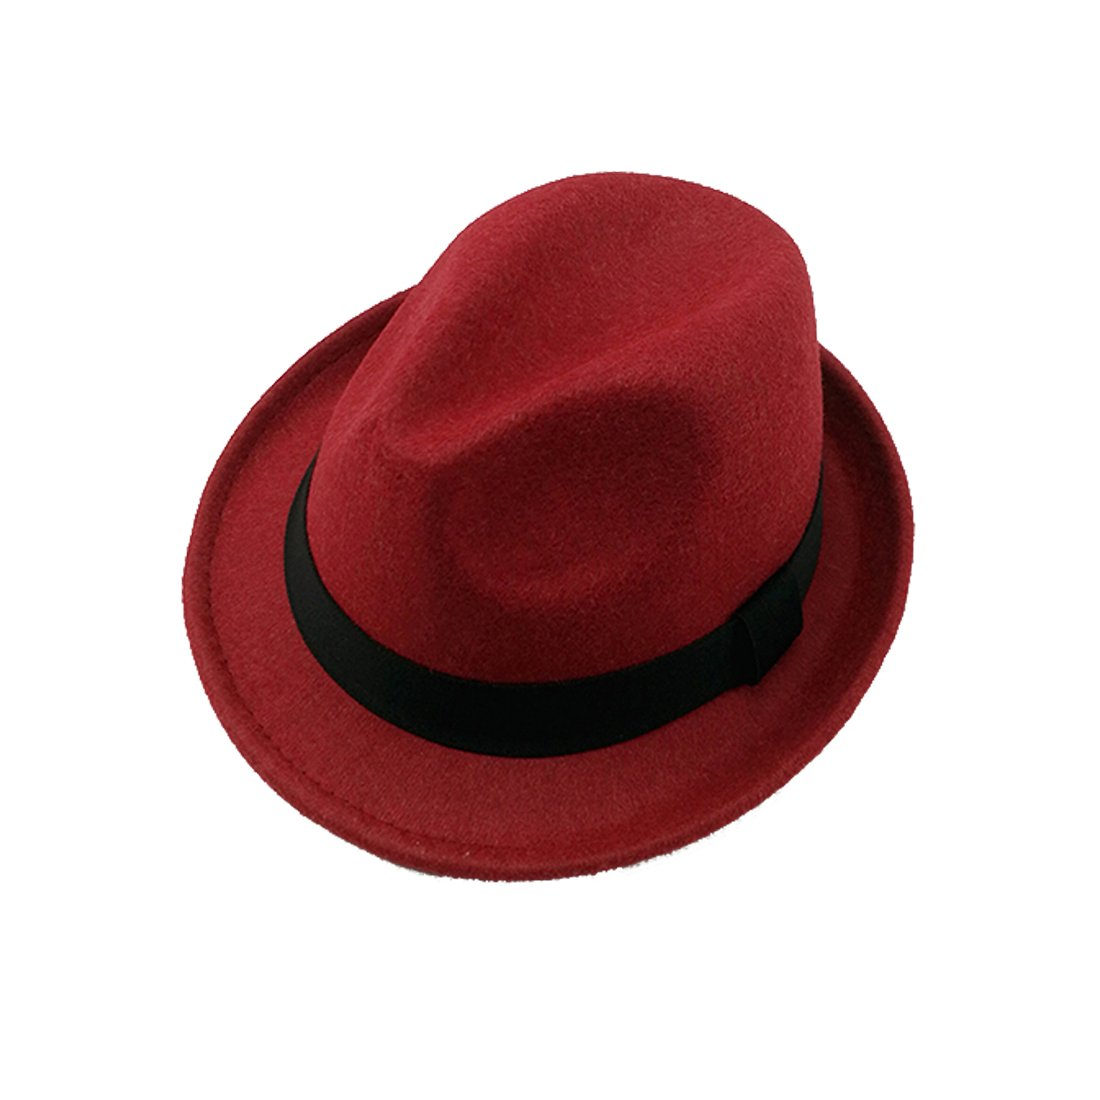 Leisure Short Brim Classic Solid Color Black Band Jazz Soft Wool Blend Fedora Hat Winter